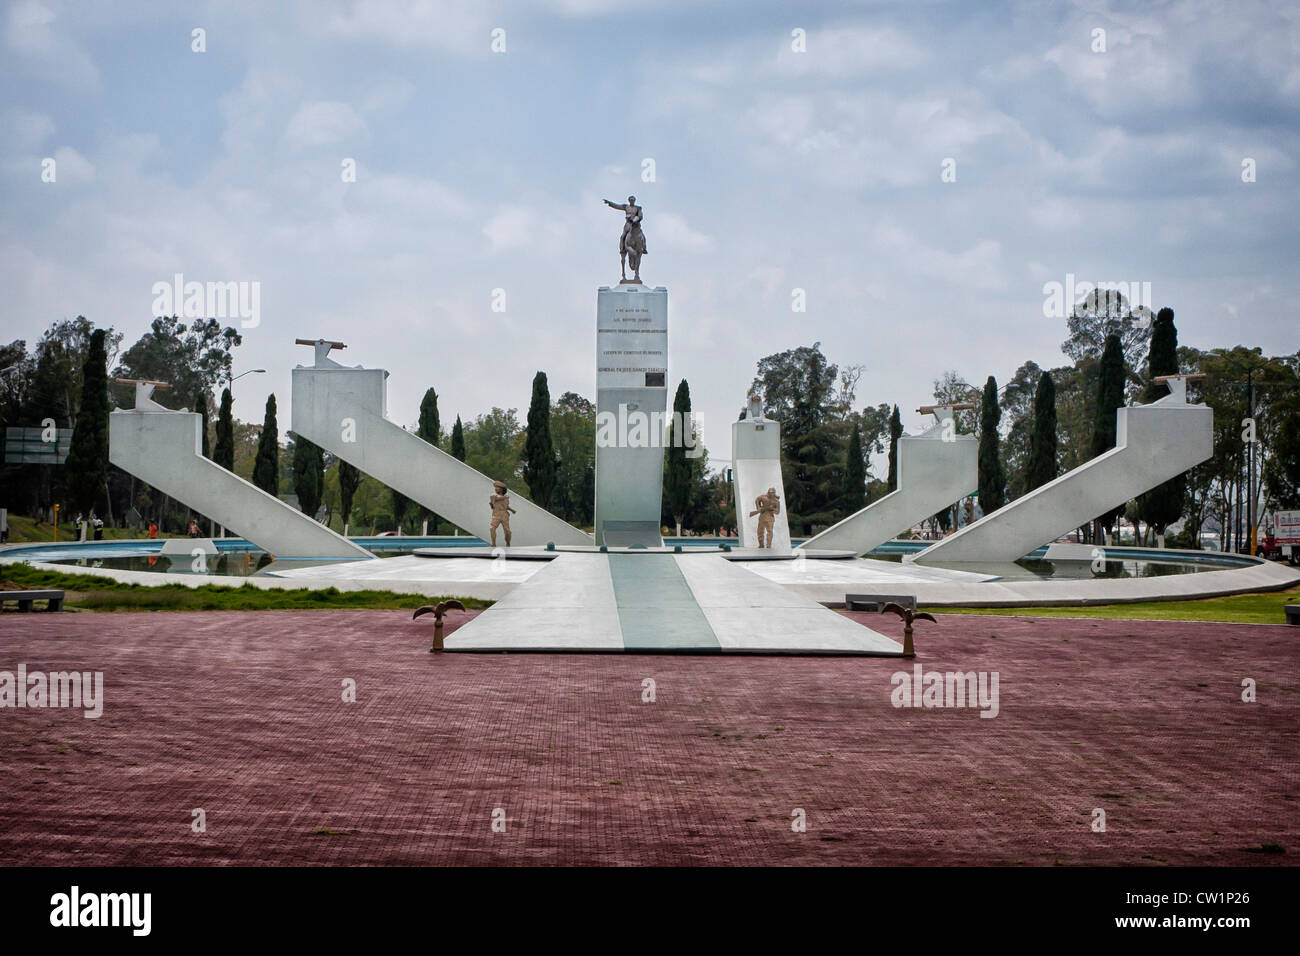 Monumento al General Ignacio Zaragoza in Puebla, Mexiko. Ignacio Zaragoza Seguín war ein General in der mexikanischen Stockbild